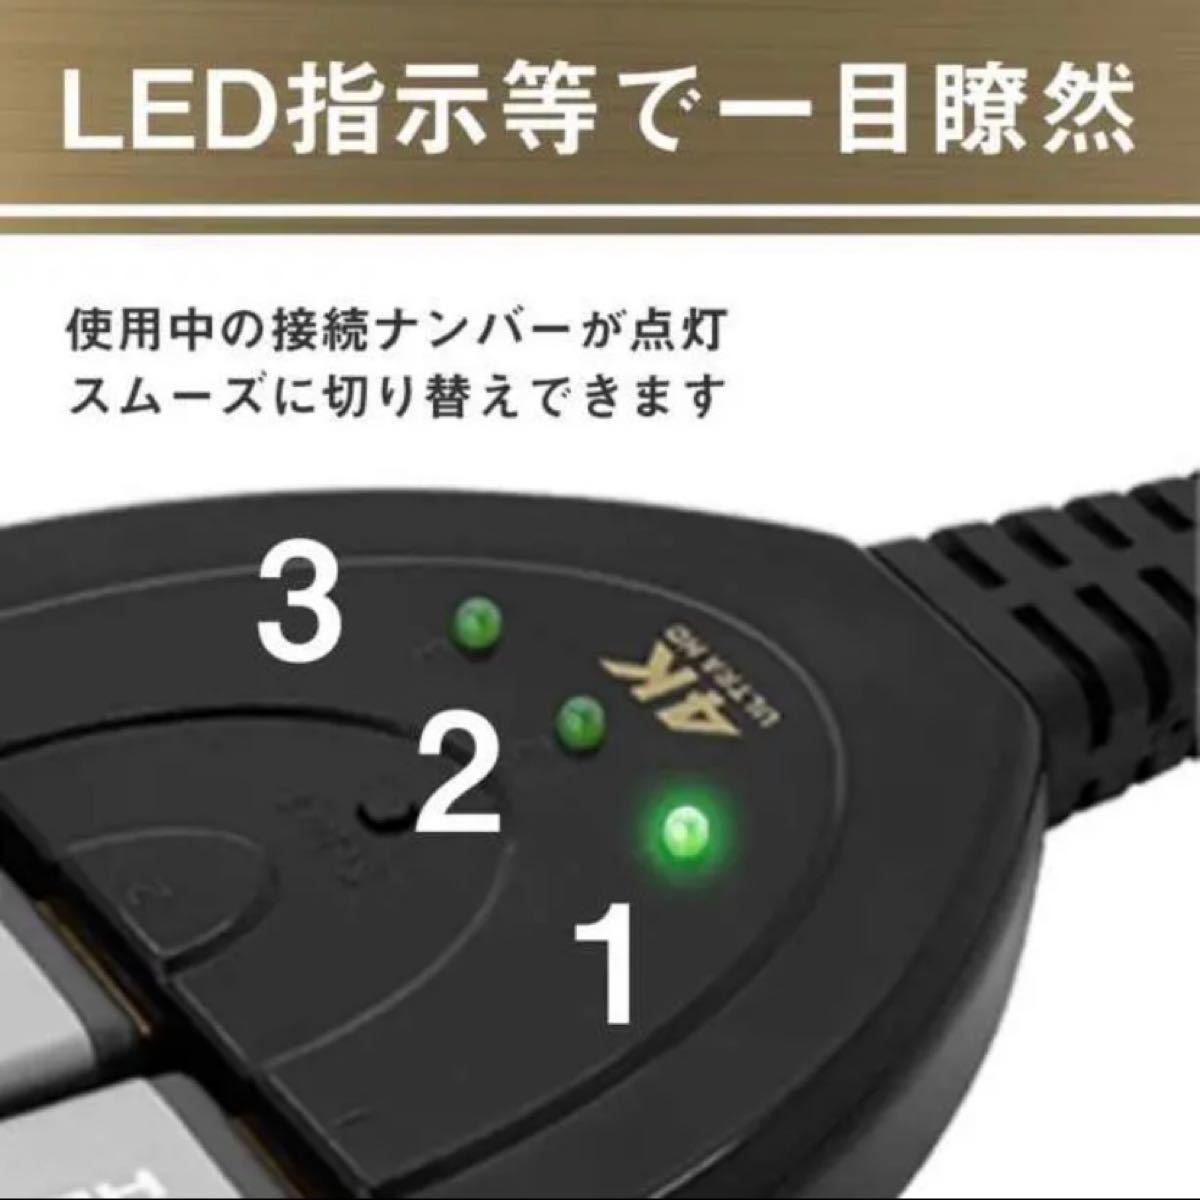 1.5m HDMI セレクタ 切替器 分配器 3入力1出力 ゲーム ケーブル